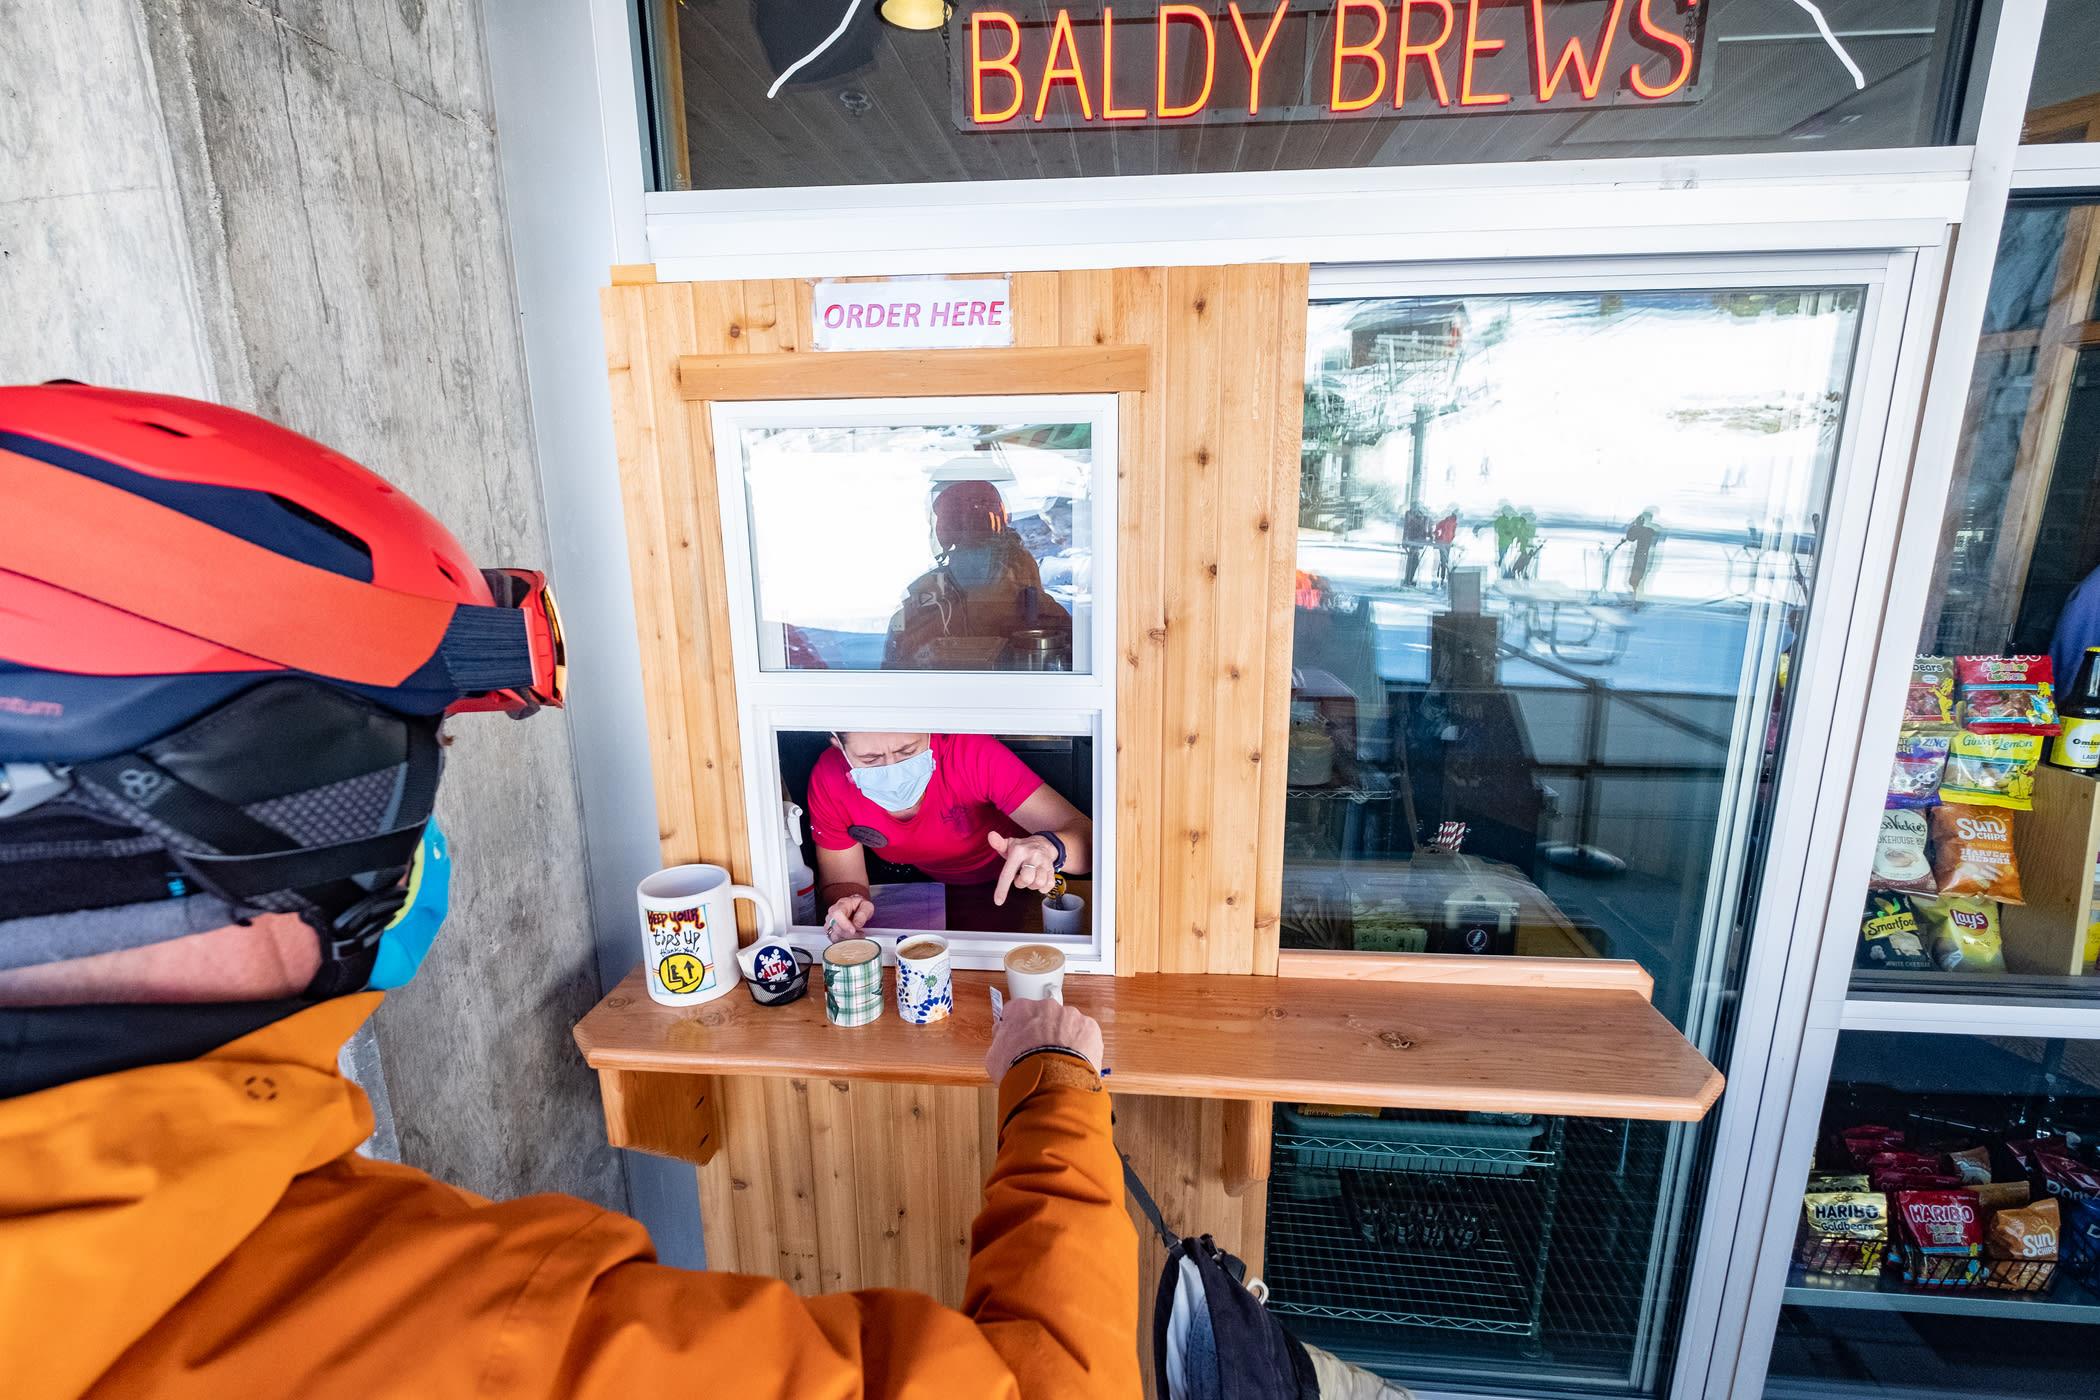 Slopside coffee at Baldy Brews